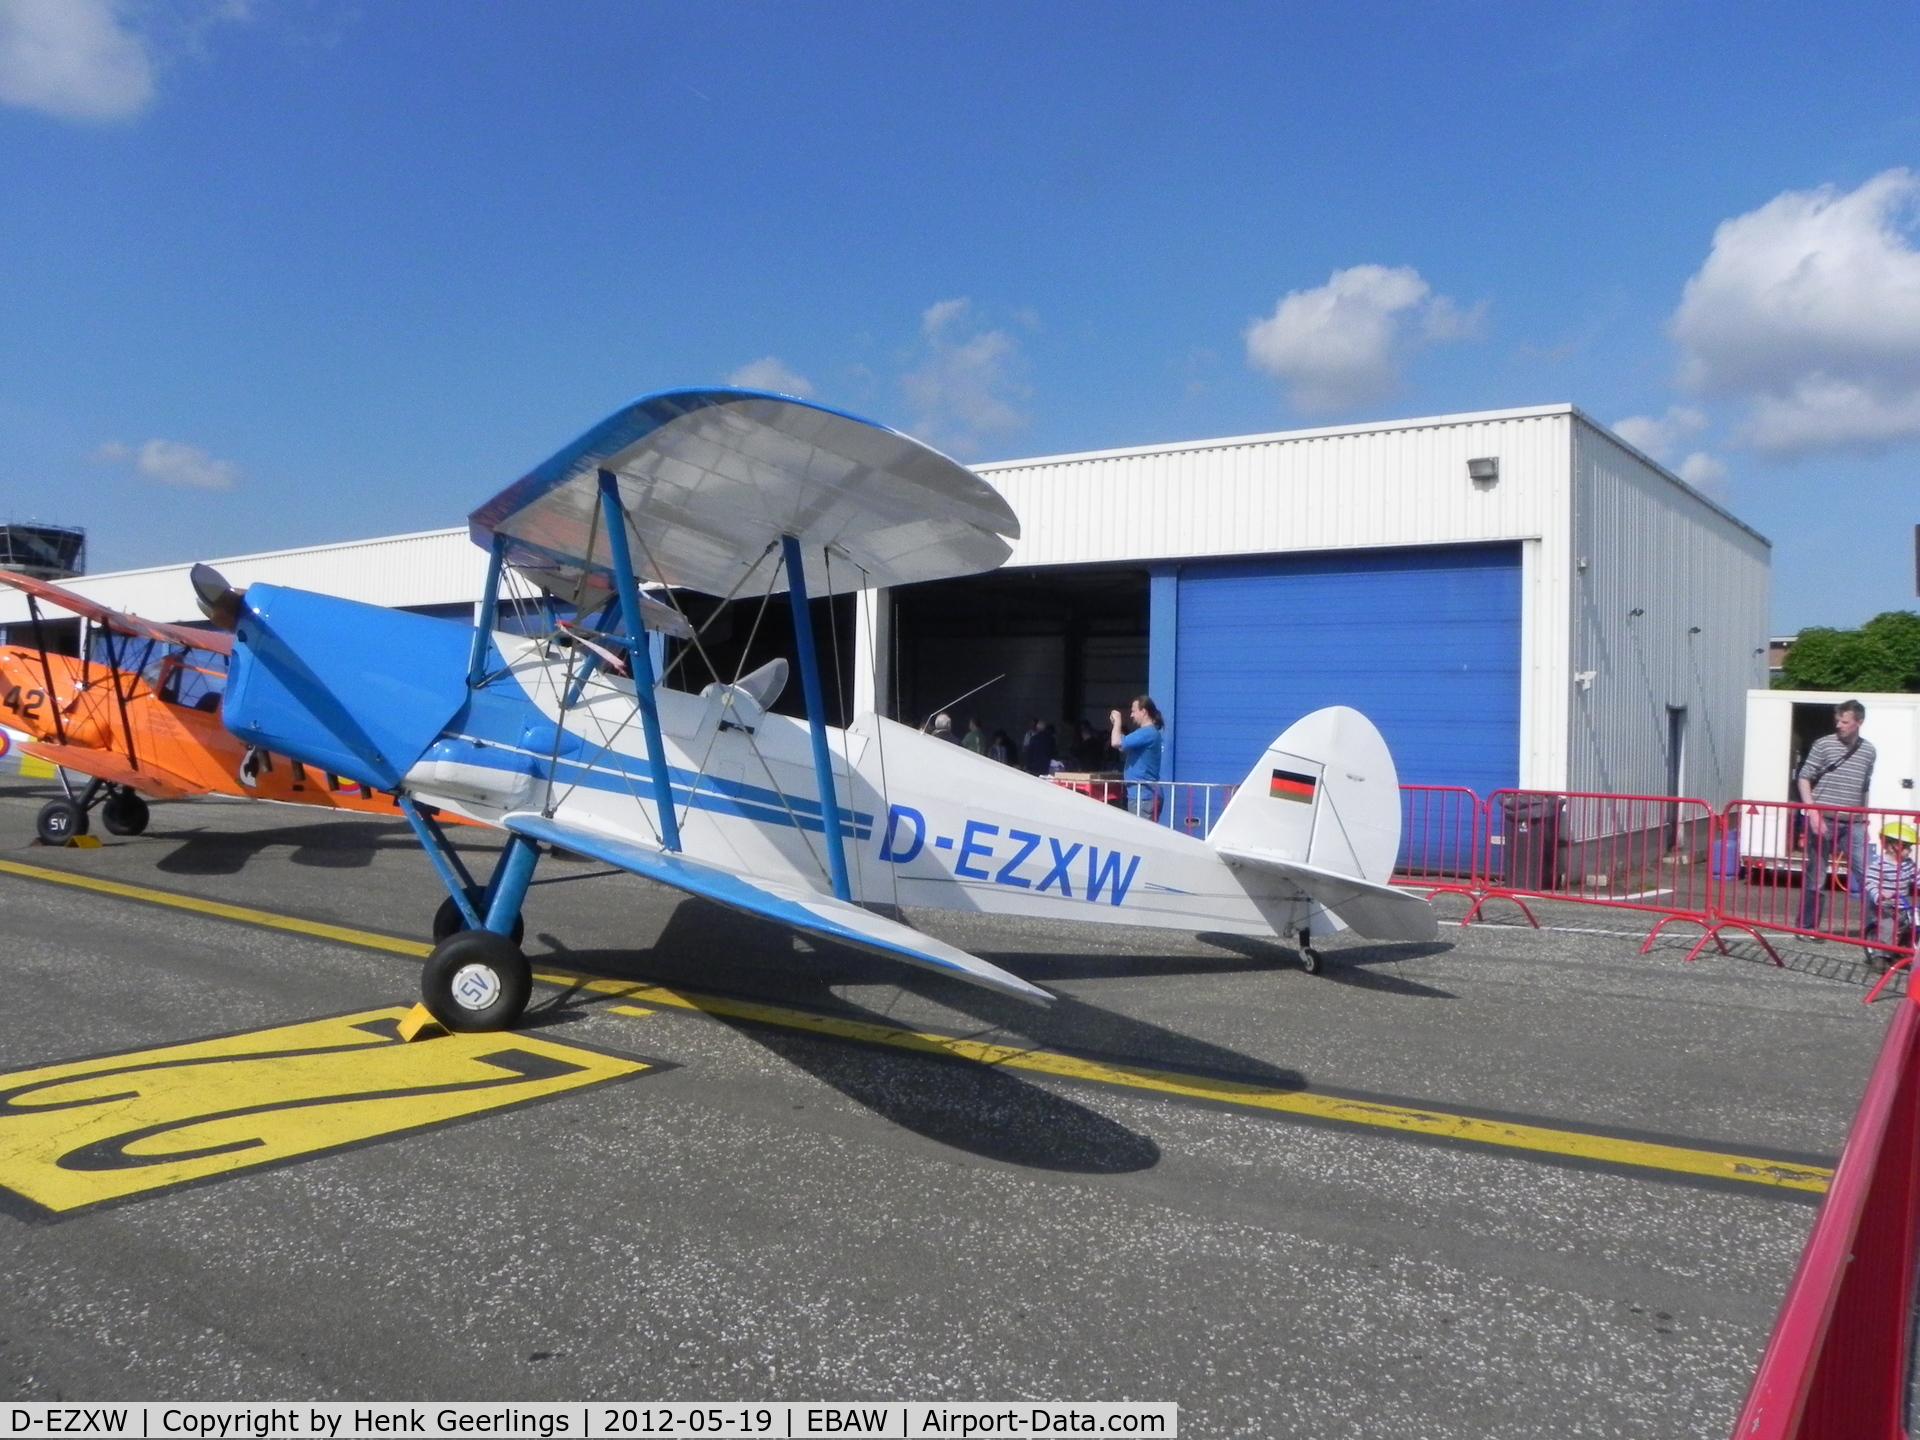 D-EZXW, Stampe-Vertongen SV-4C C/N 530, Stampe Fly In , 2012 , Deurne Airport